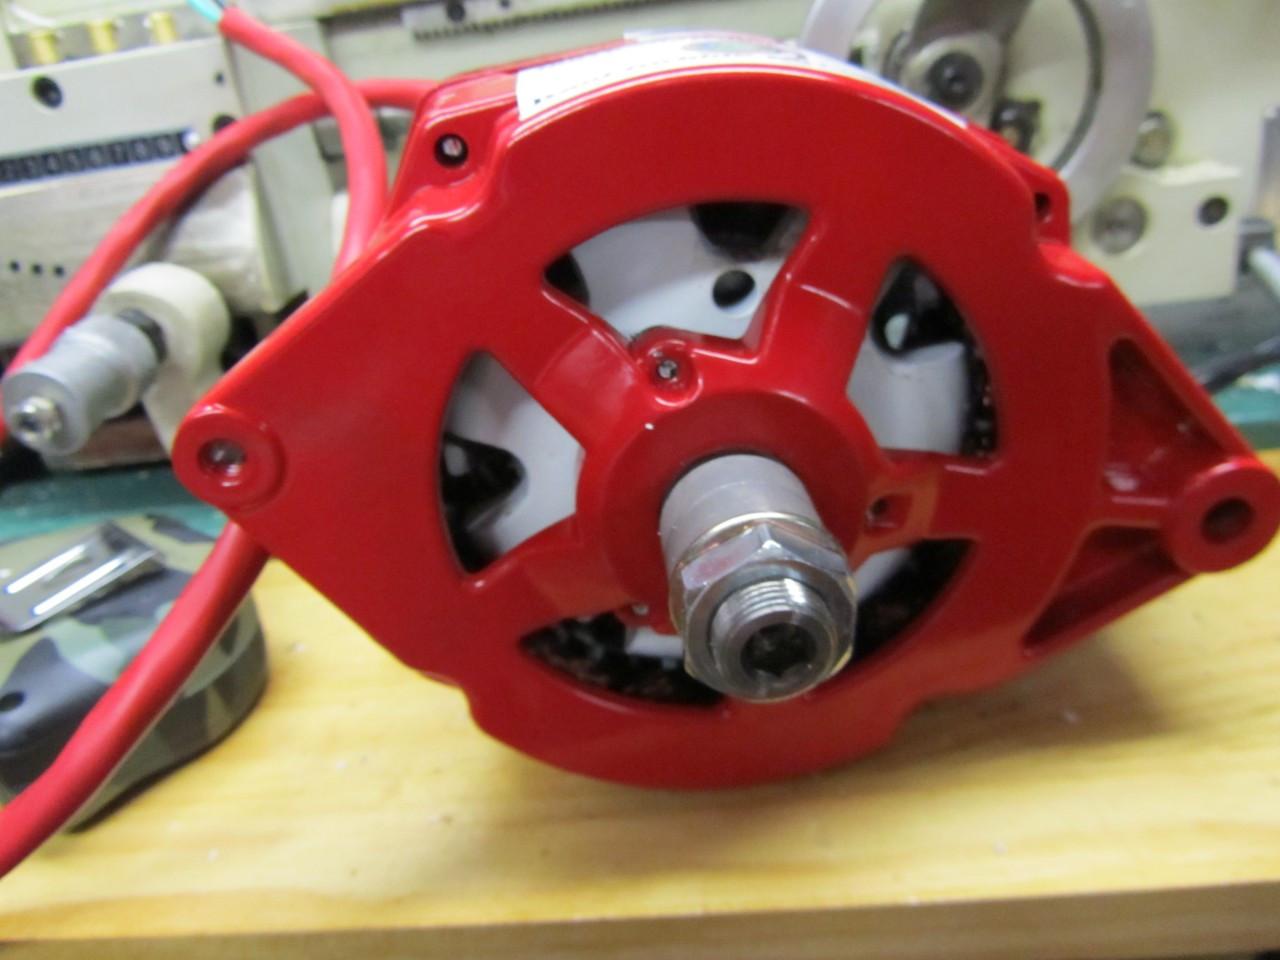 Hurricane Wind Power 12 Volt Permanent Magnet Alternator PMA